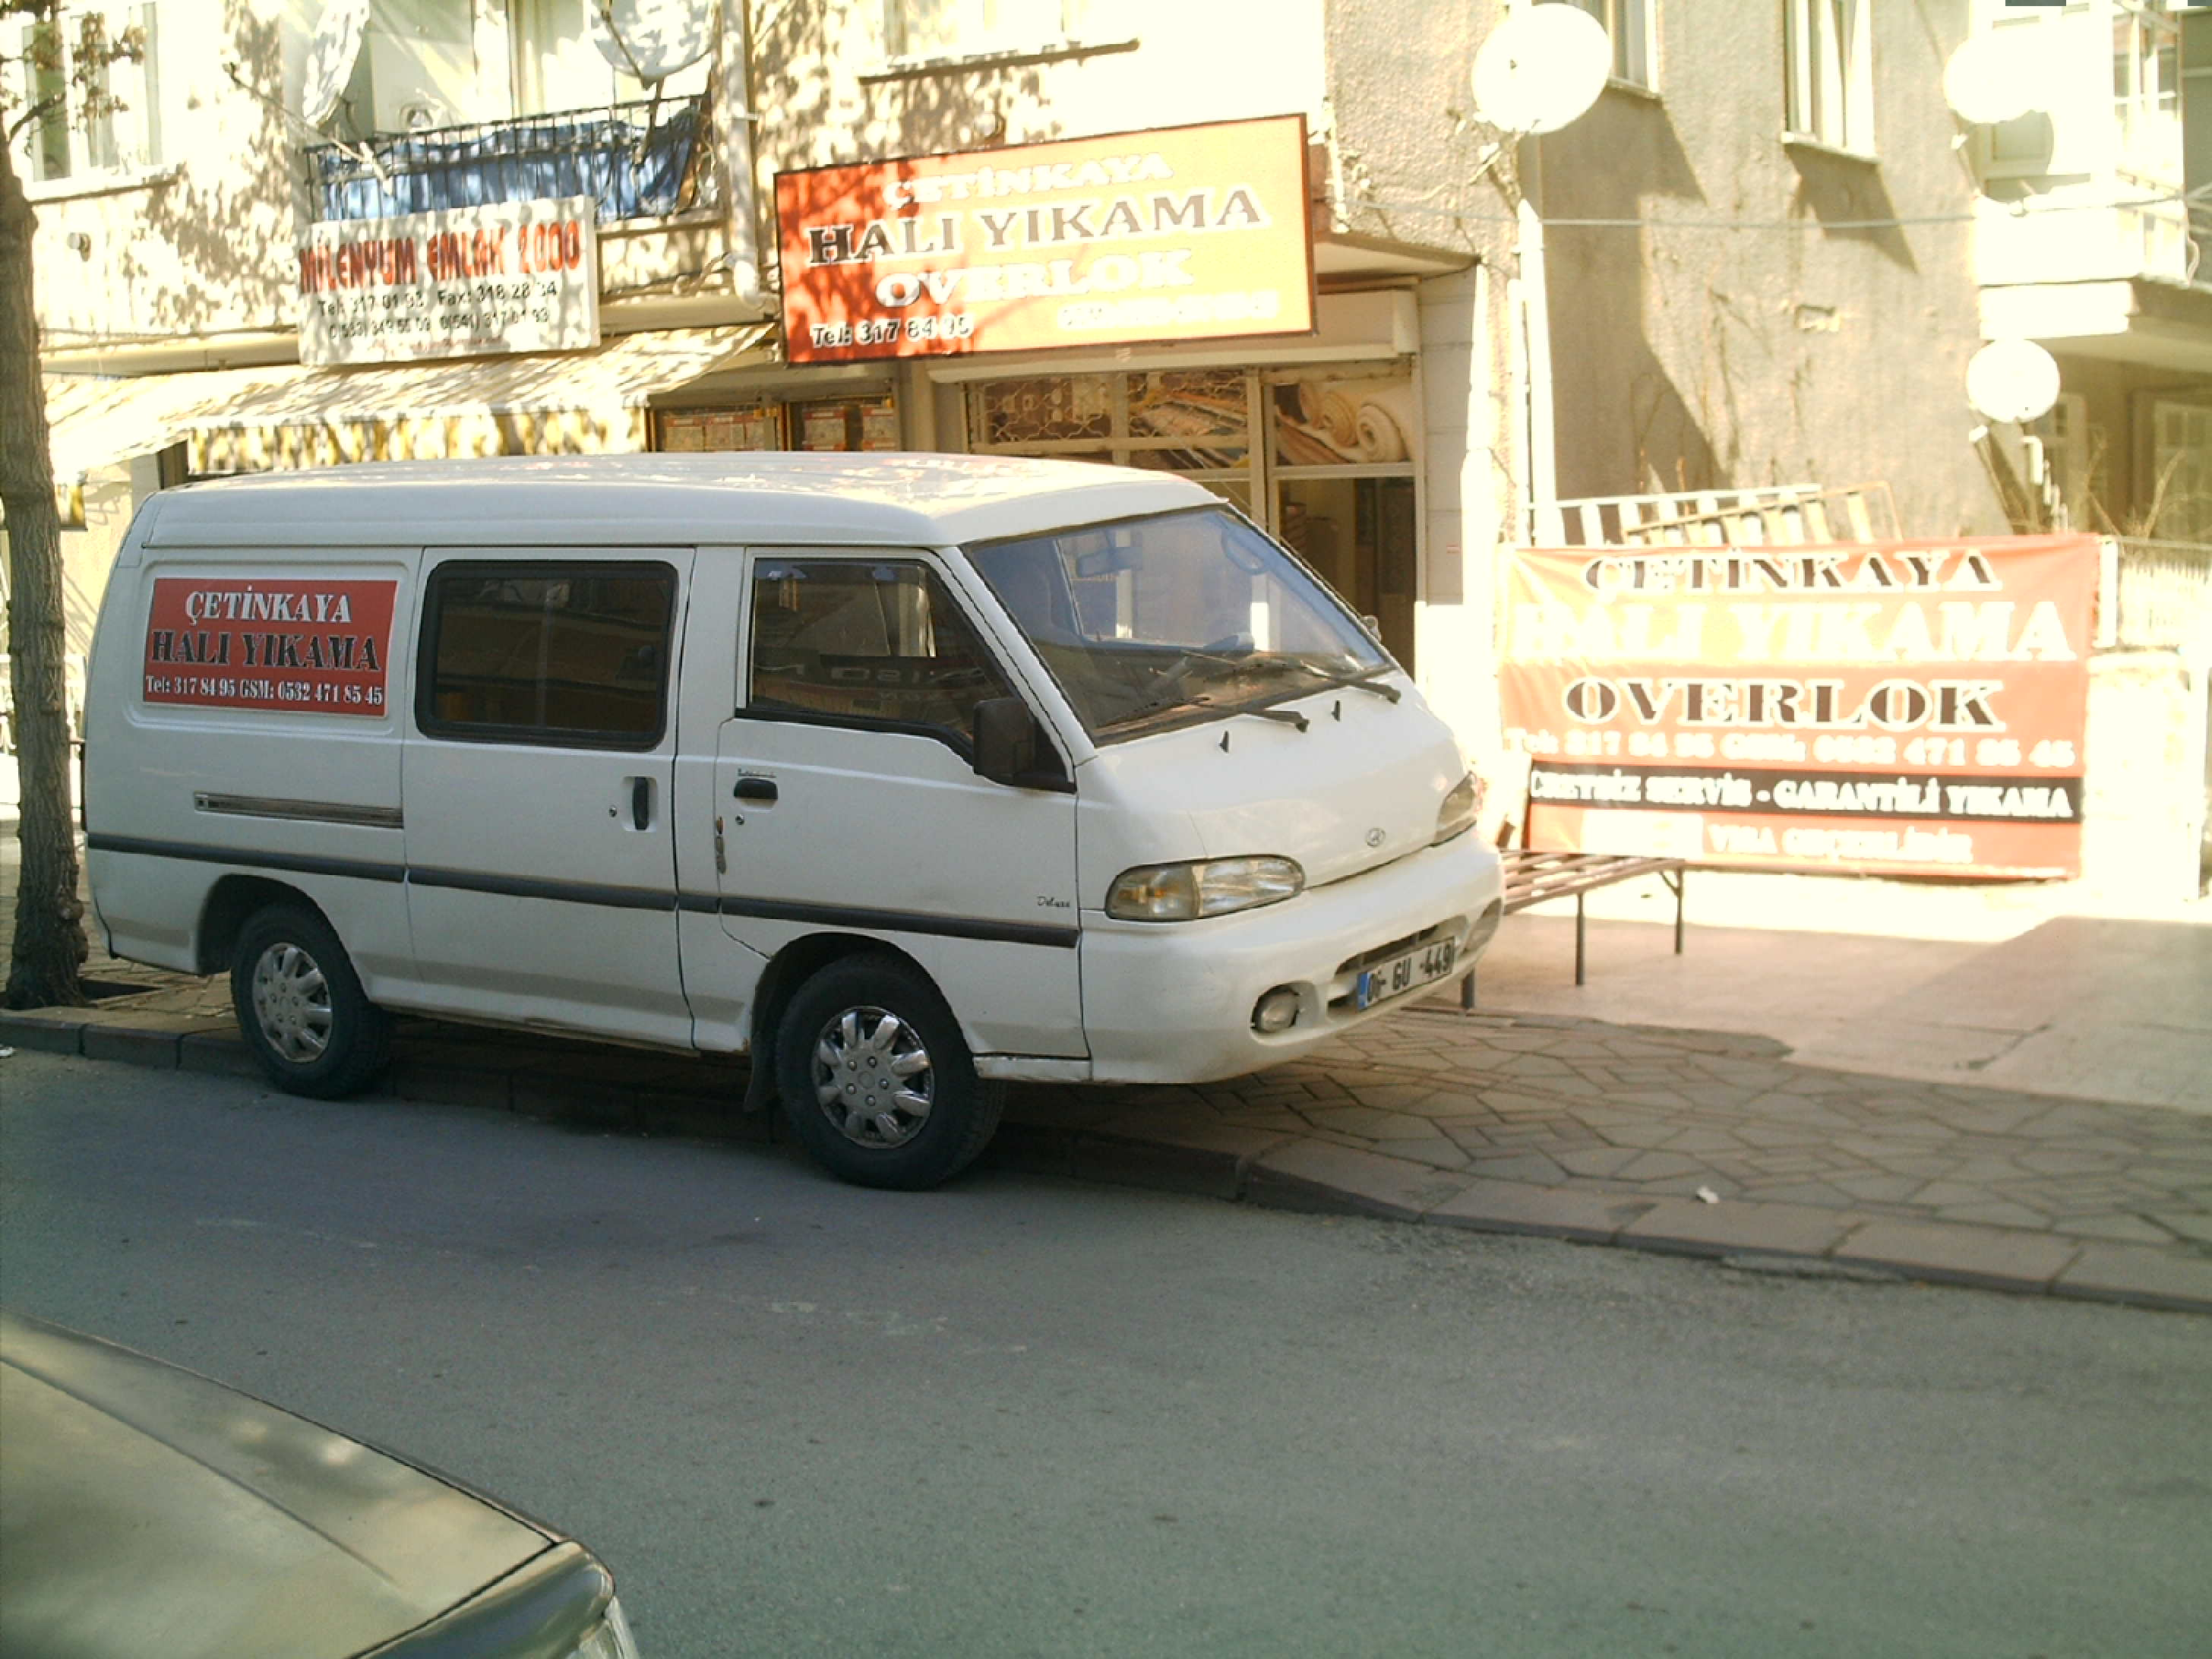 camlik_hali_yikama_servis-1